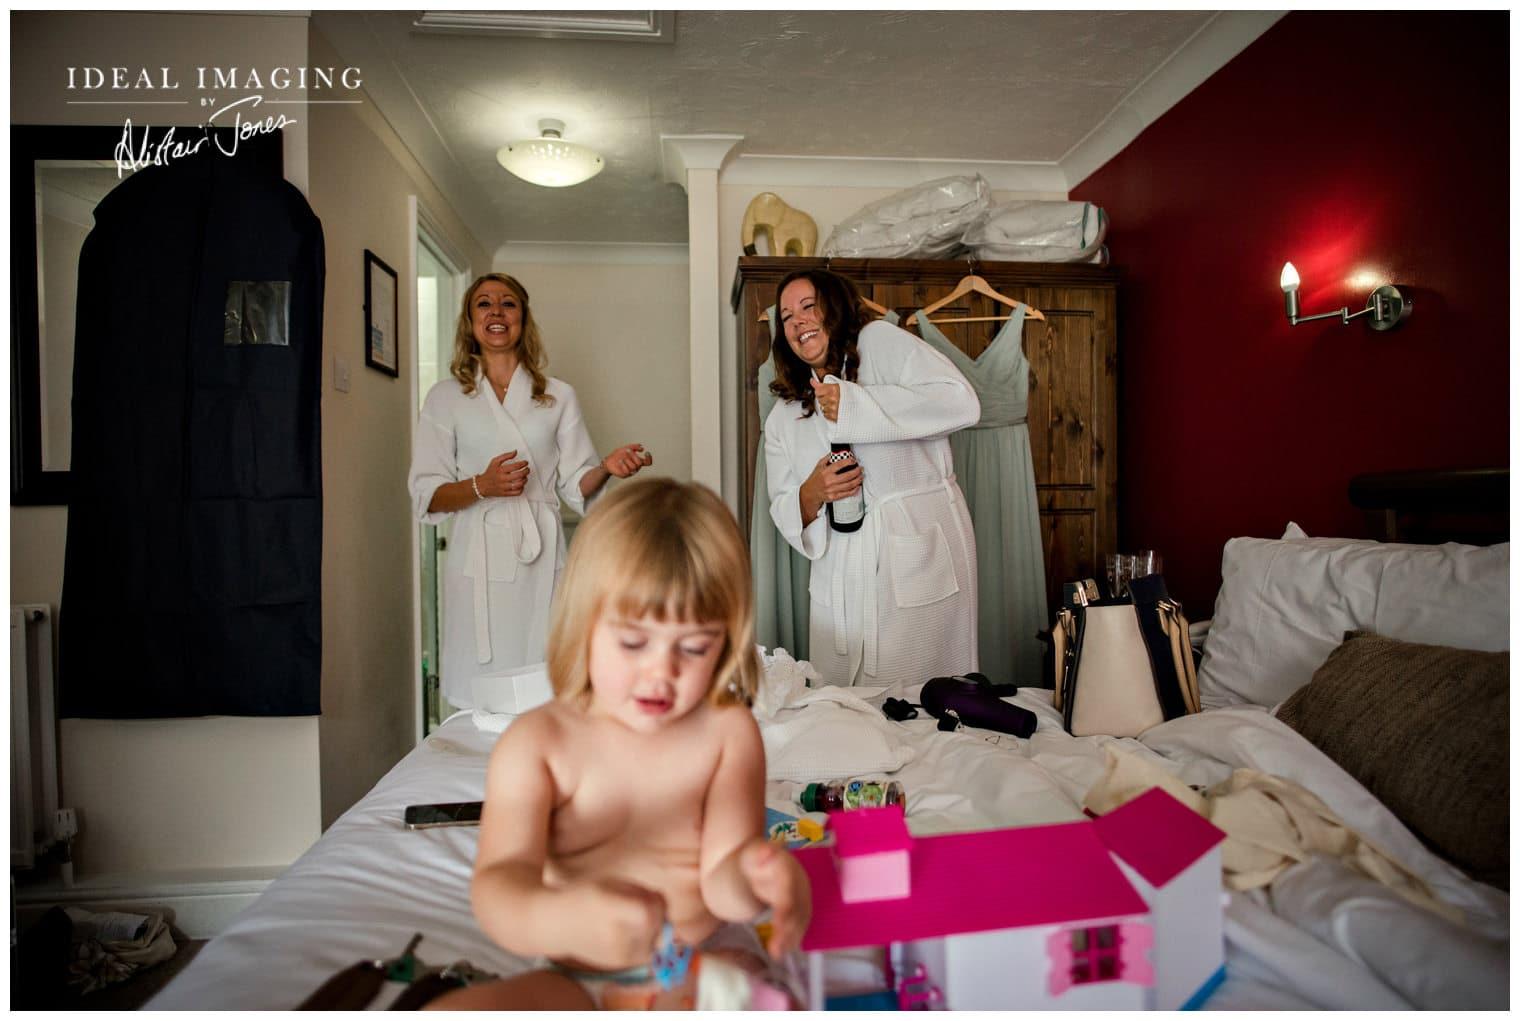 canterbury_cathedral_wedding-025